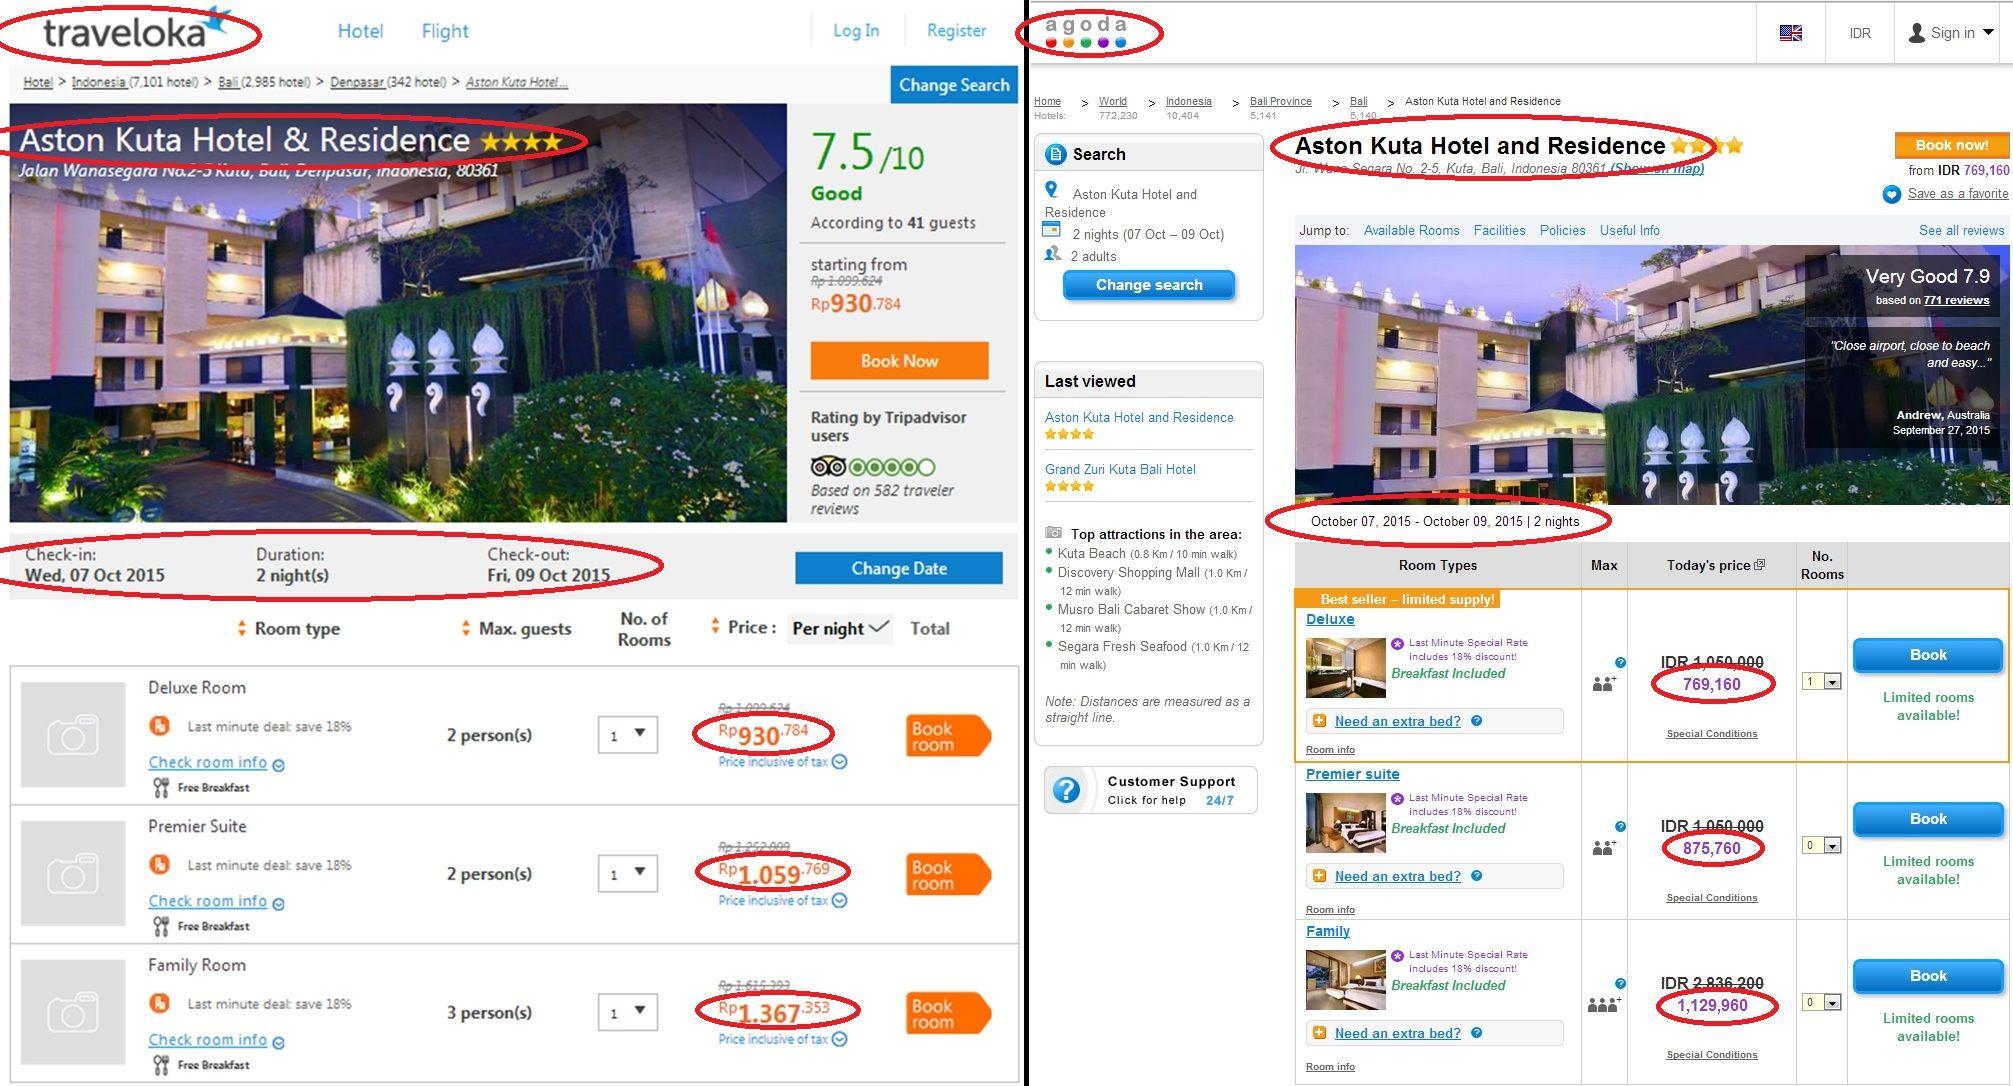 Perbandingan Harga Booking Tiket Aston Kuta Hotel Residence Di Traveloka Dan Agoda